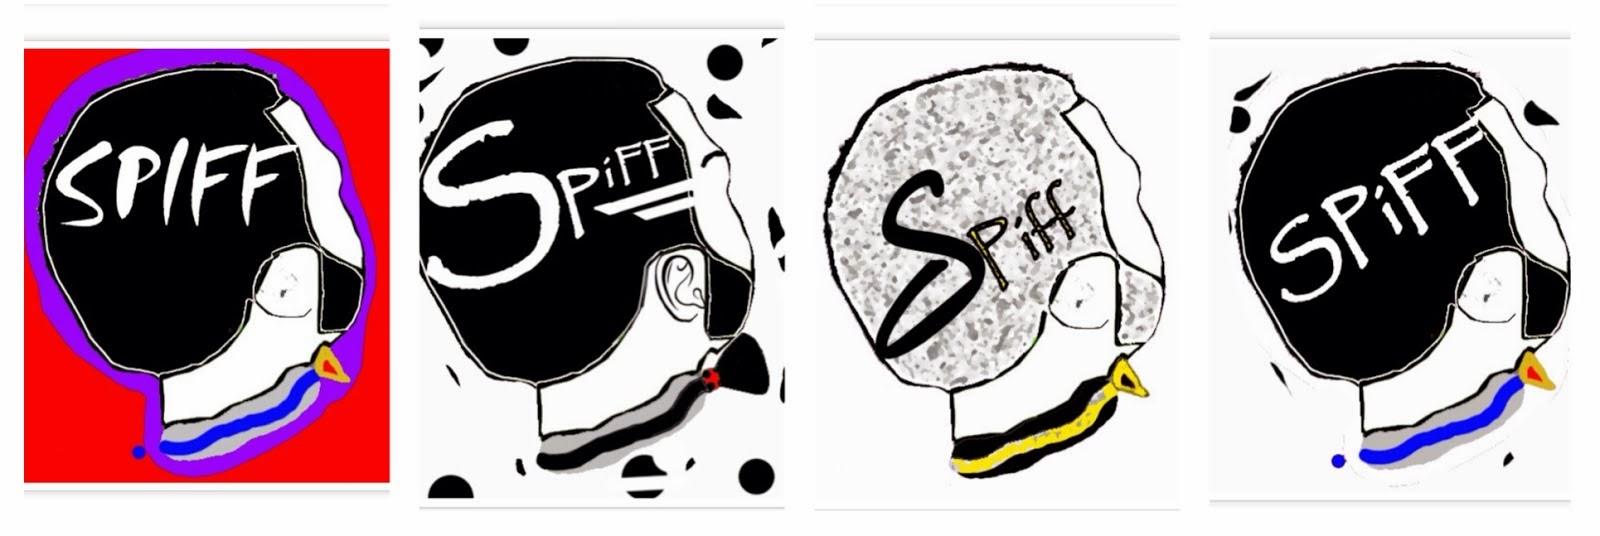 ~SpiFFy Noggin'!~